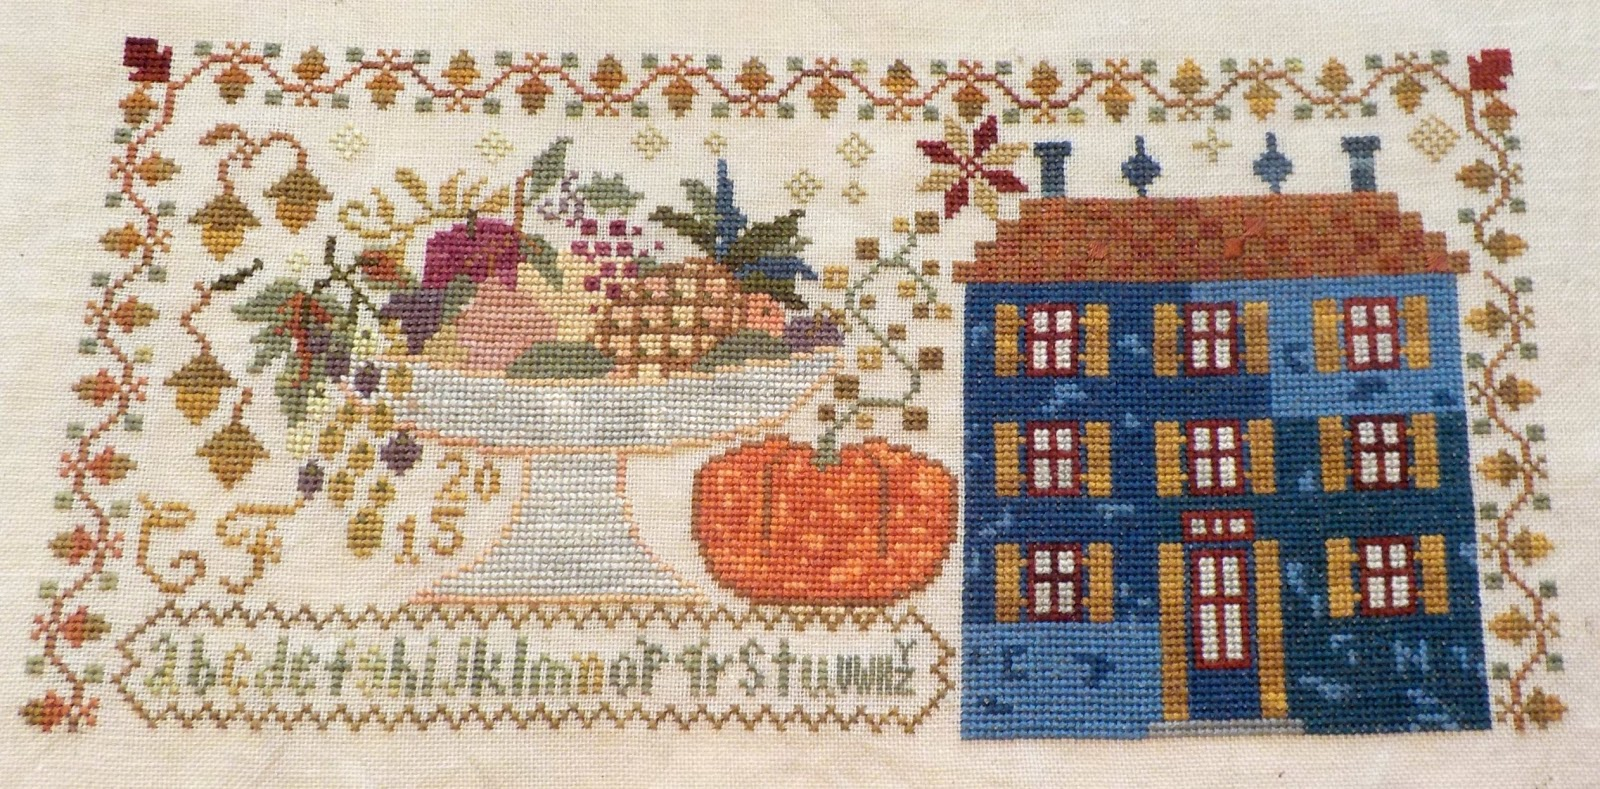 Feast of Friendship Blackbird Designs Cross Stitch Pattern